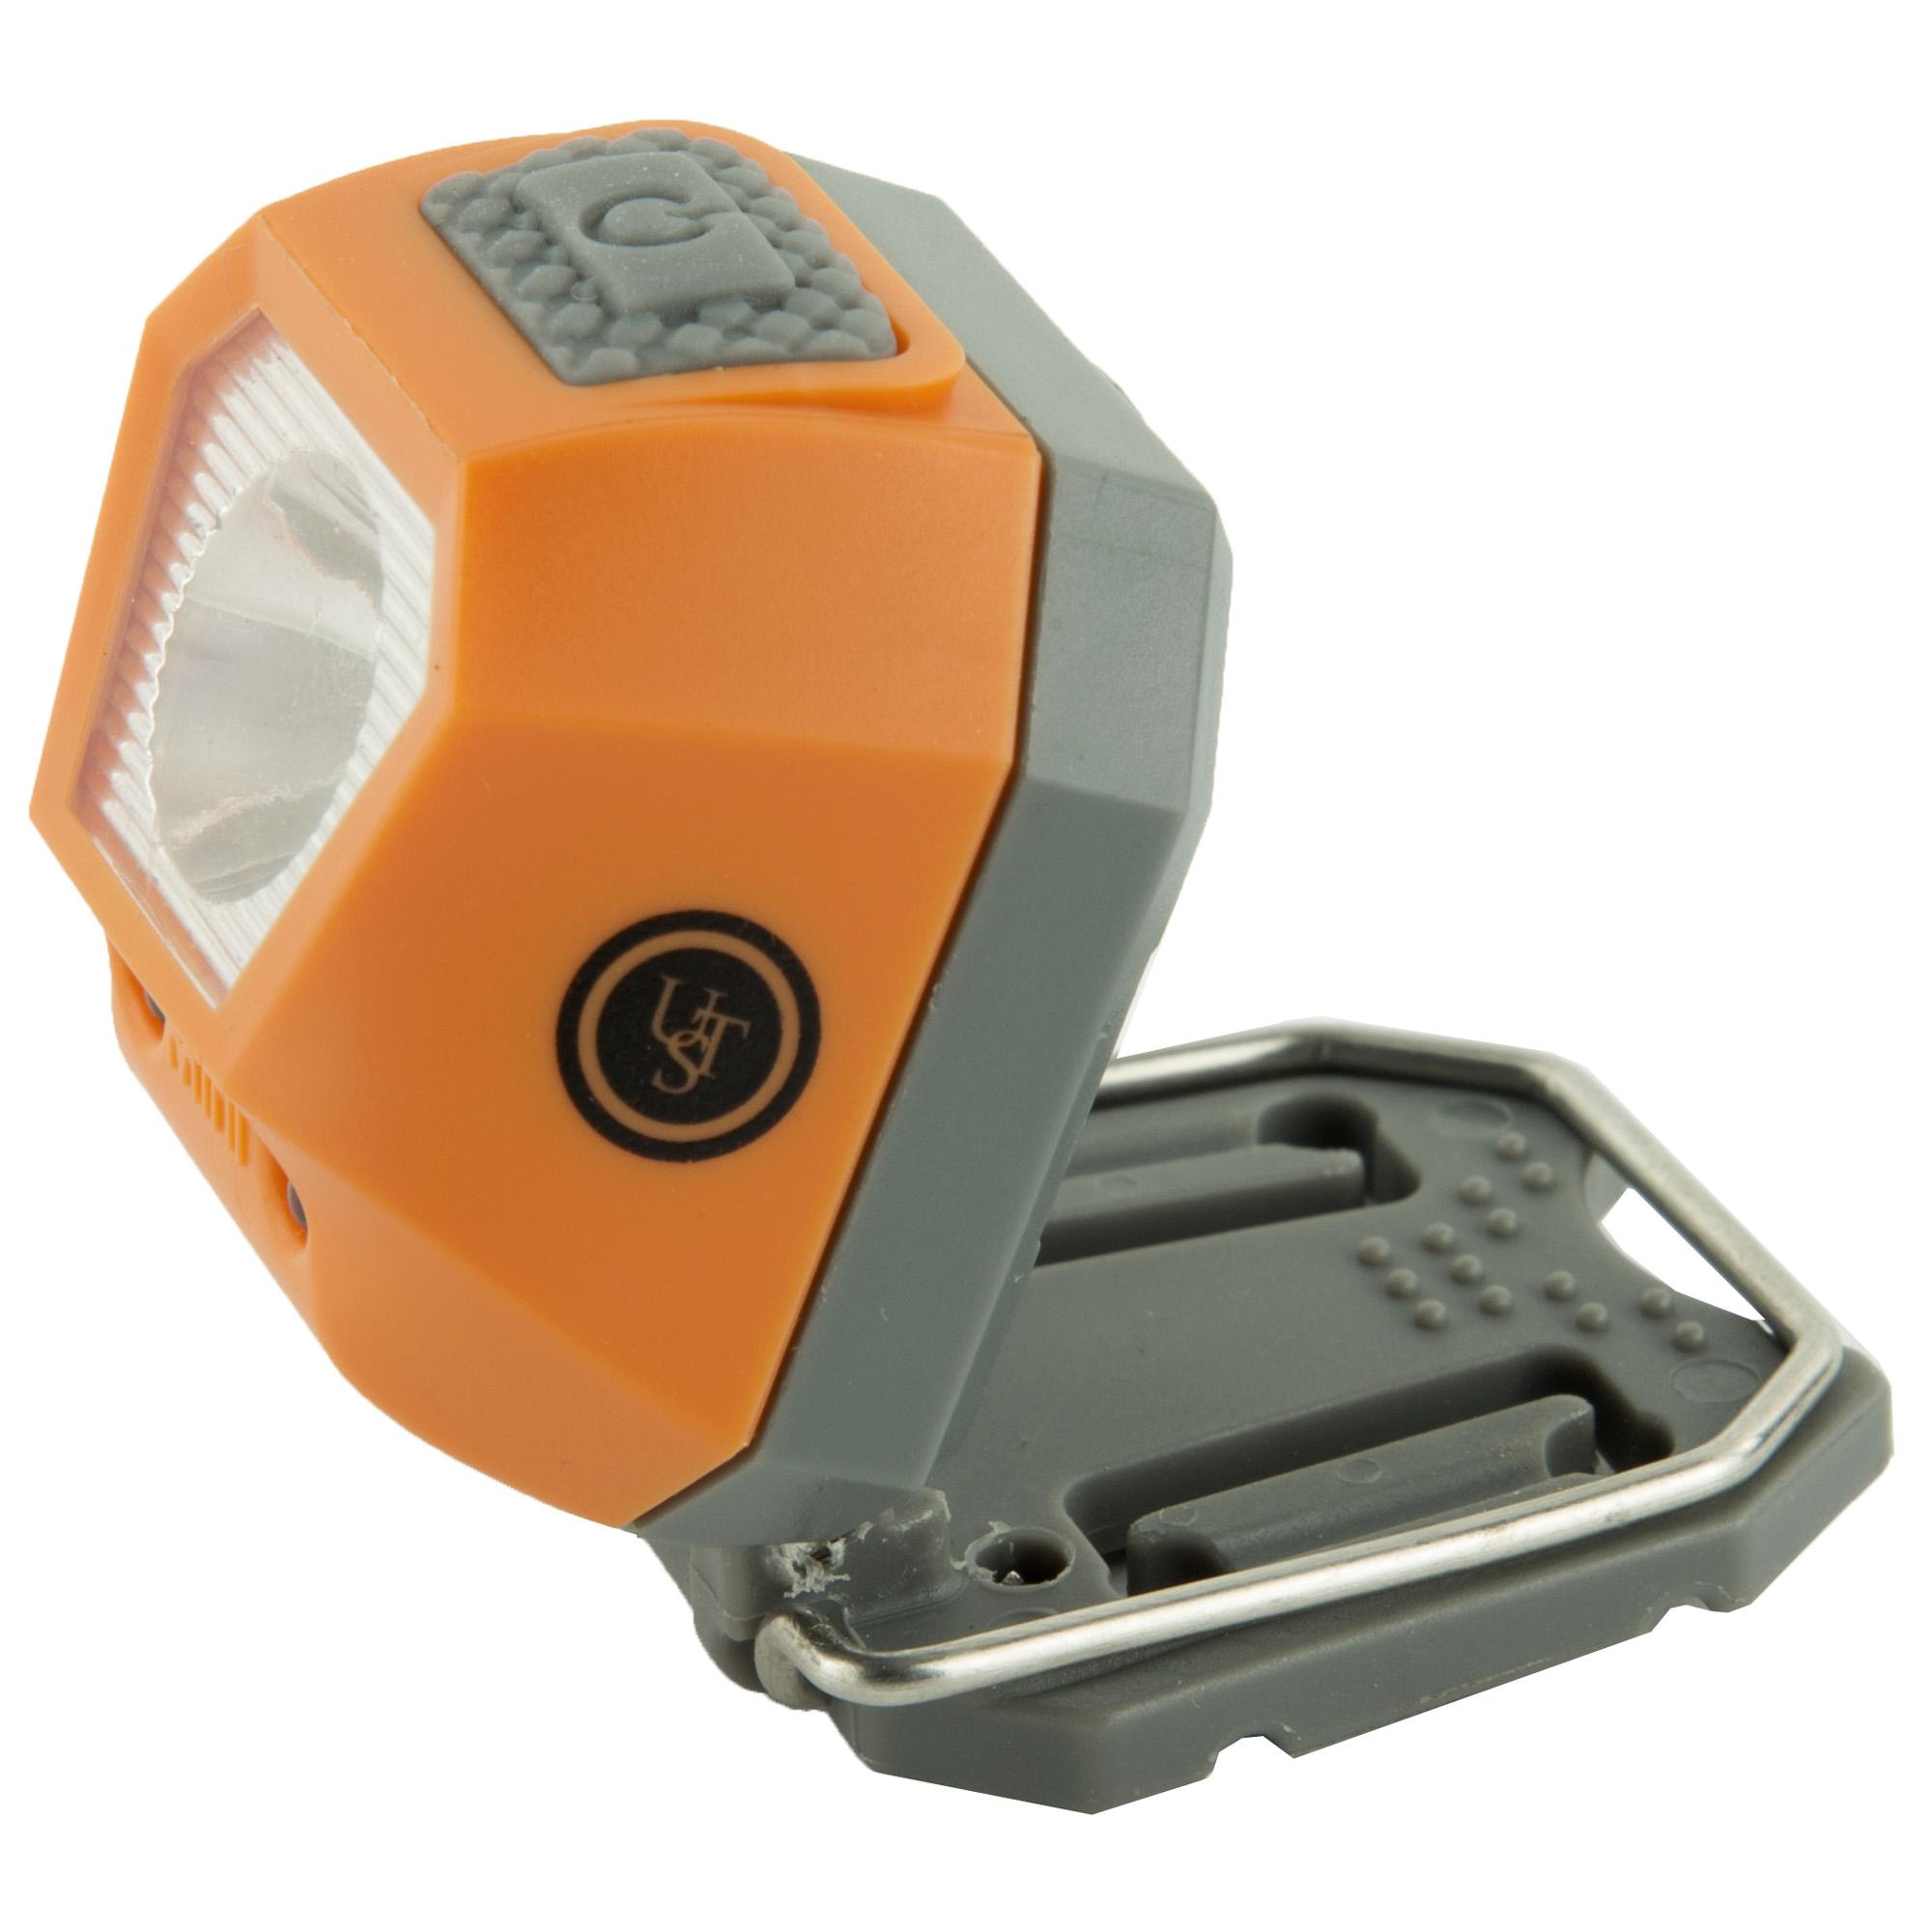 Ust Tight Light 1.0 Orange